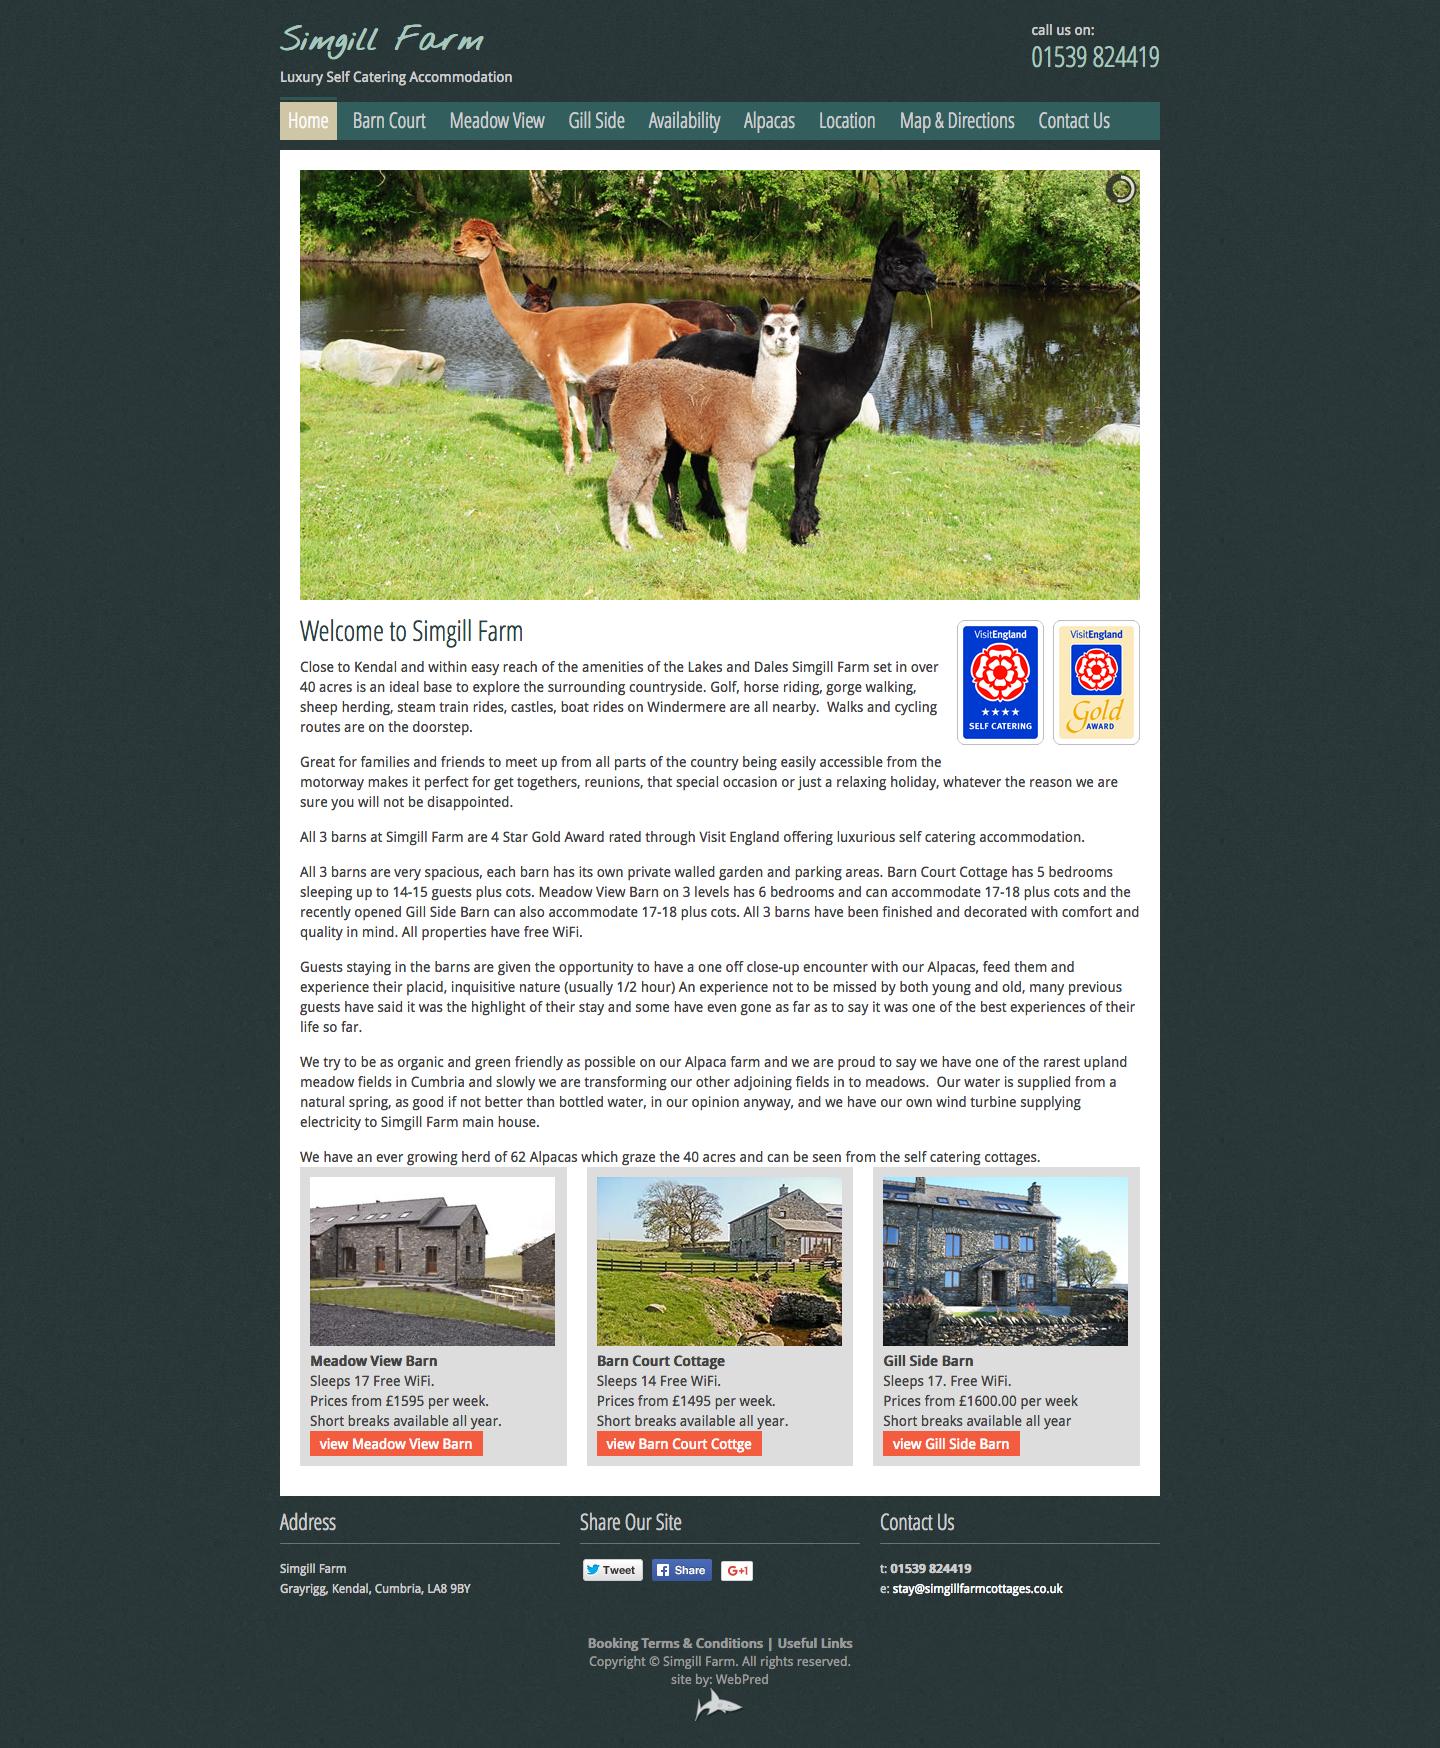 SimGill Farm Luxury 5-Star Self Catering Accommodation Grayrigg Kendal Cumbria